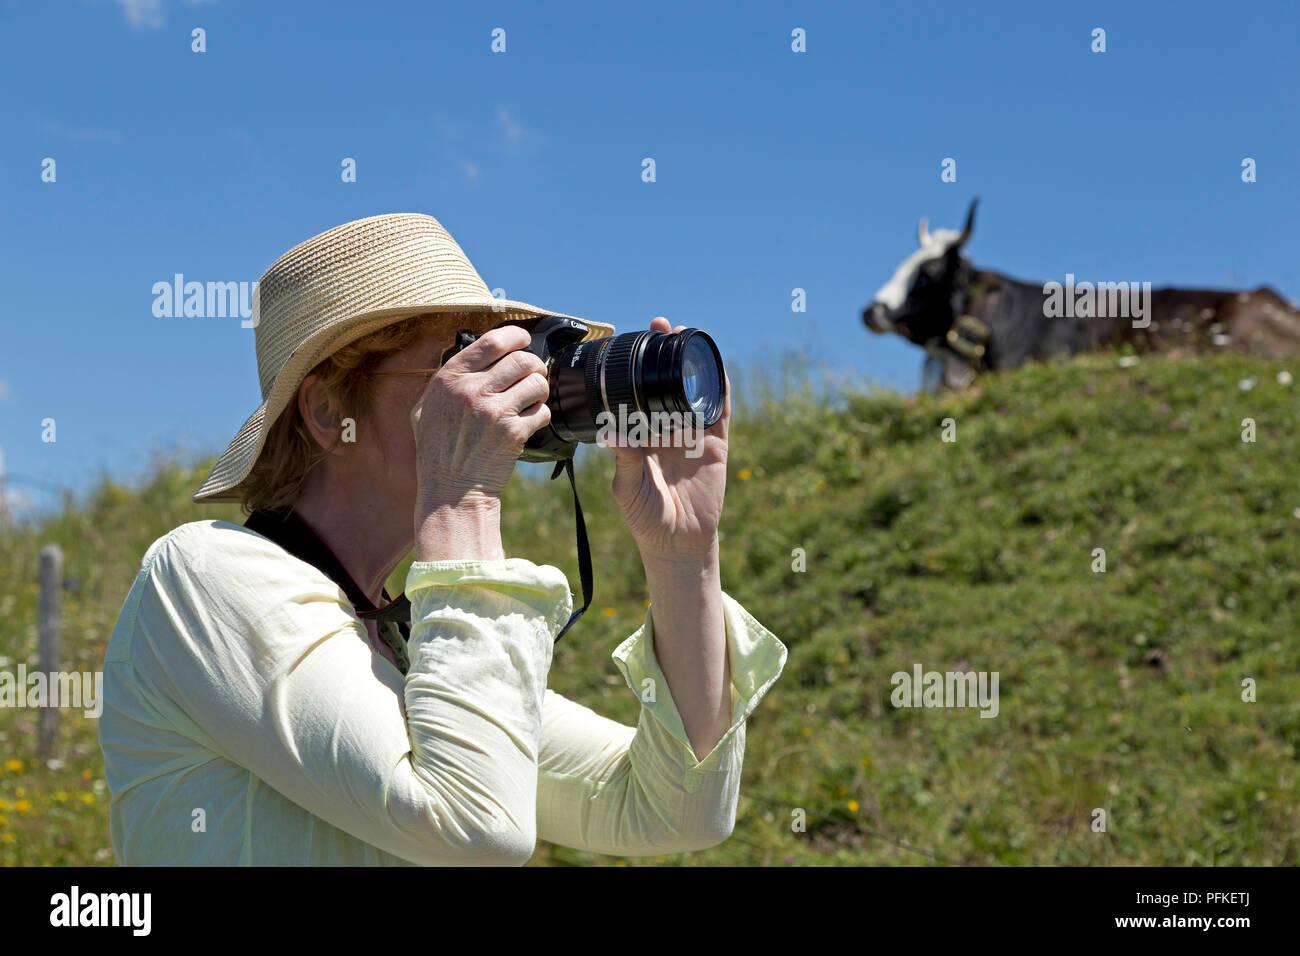 woman taking photo of cow on Hochgrat summit near Steibis, Allgaeu, Bavaria, Germany - Stock Image